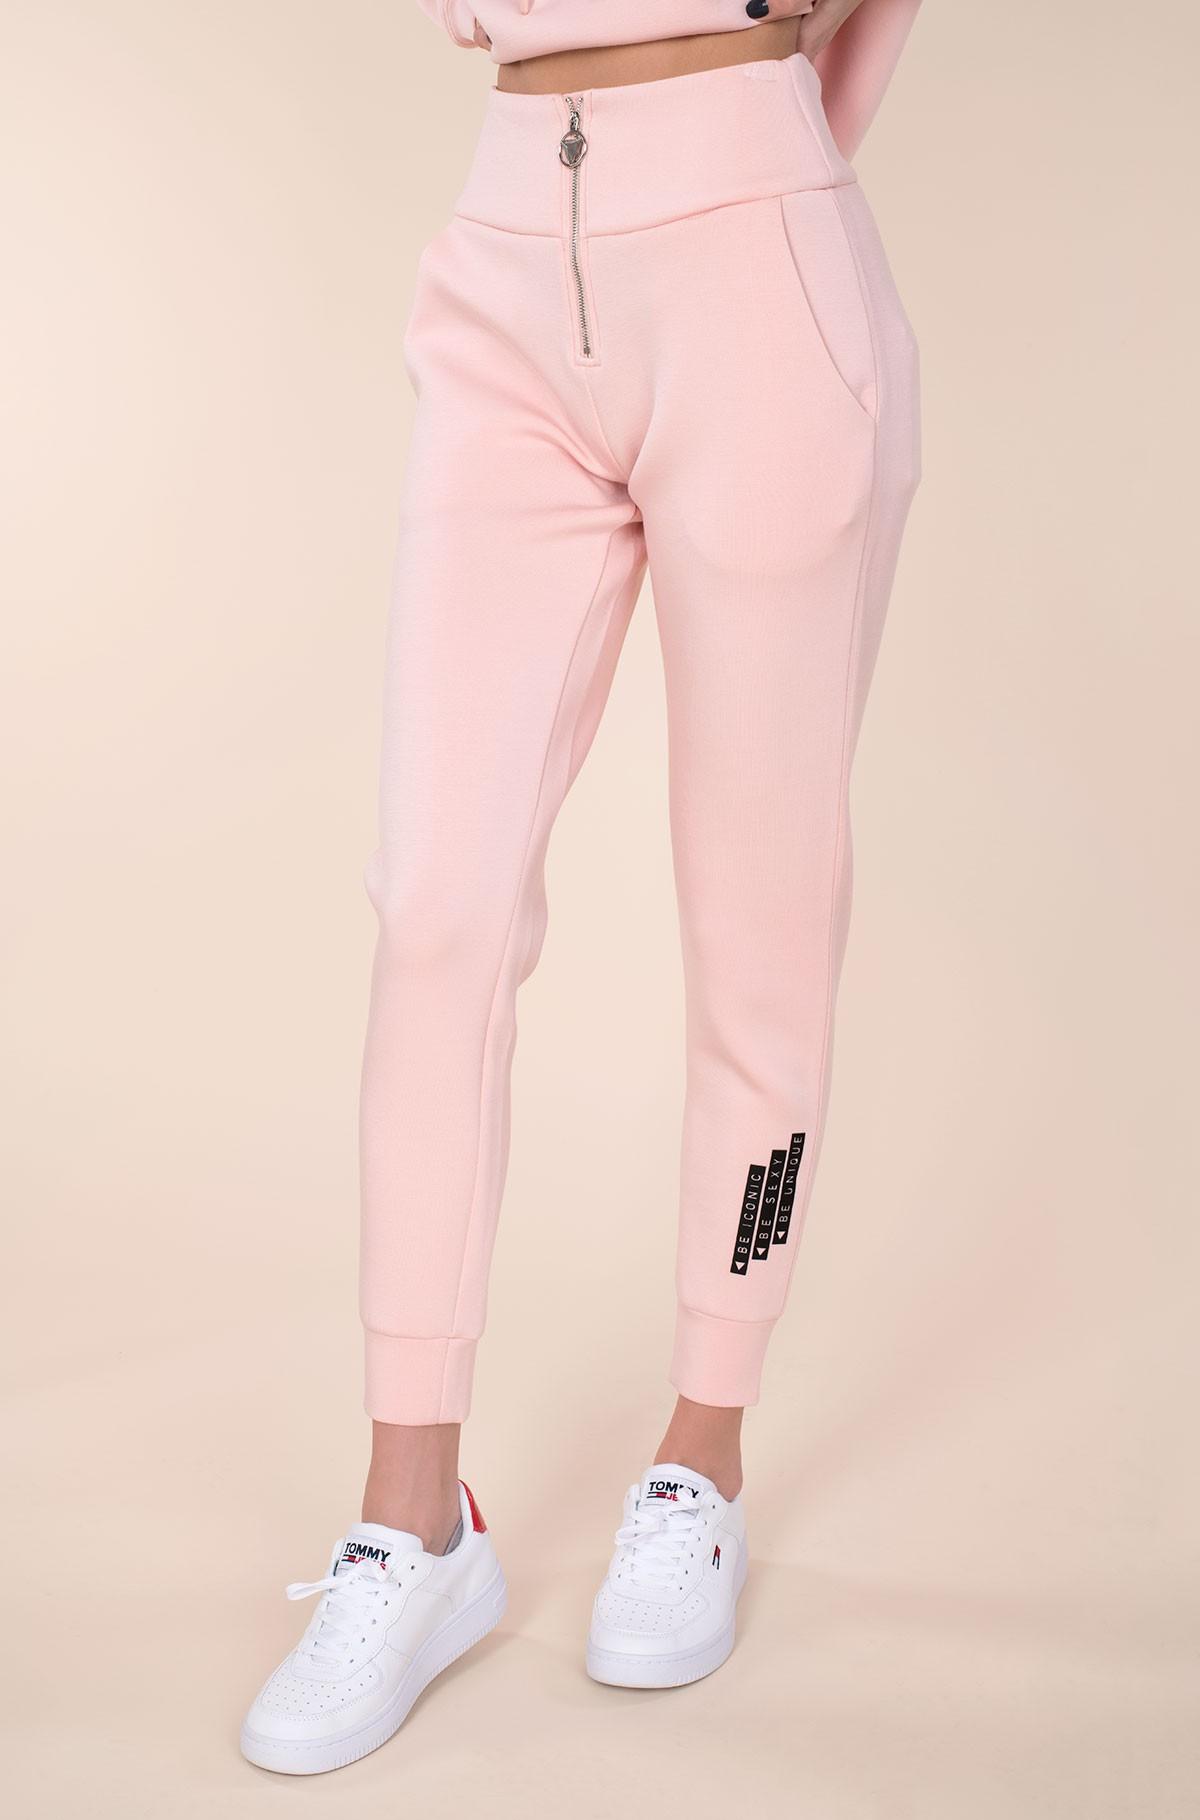 Sweatpants  W1RB04 K7UW2-full-2